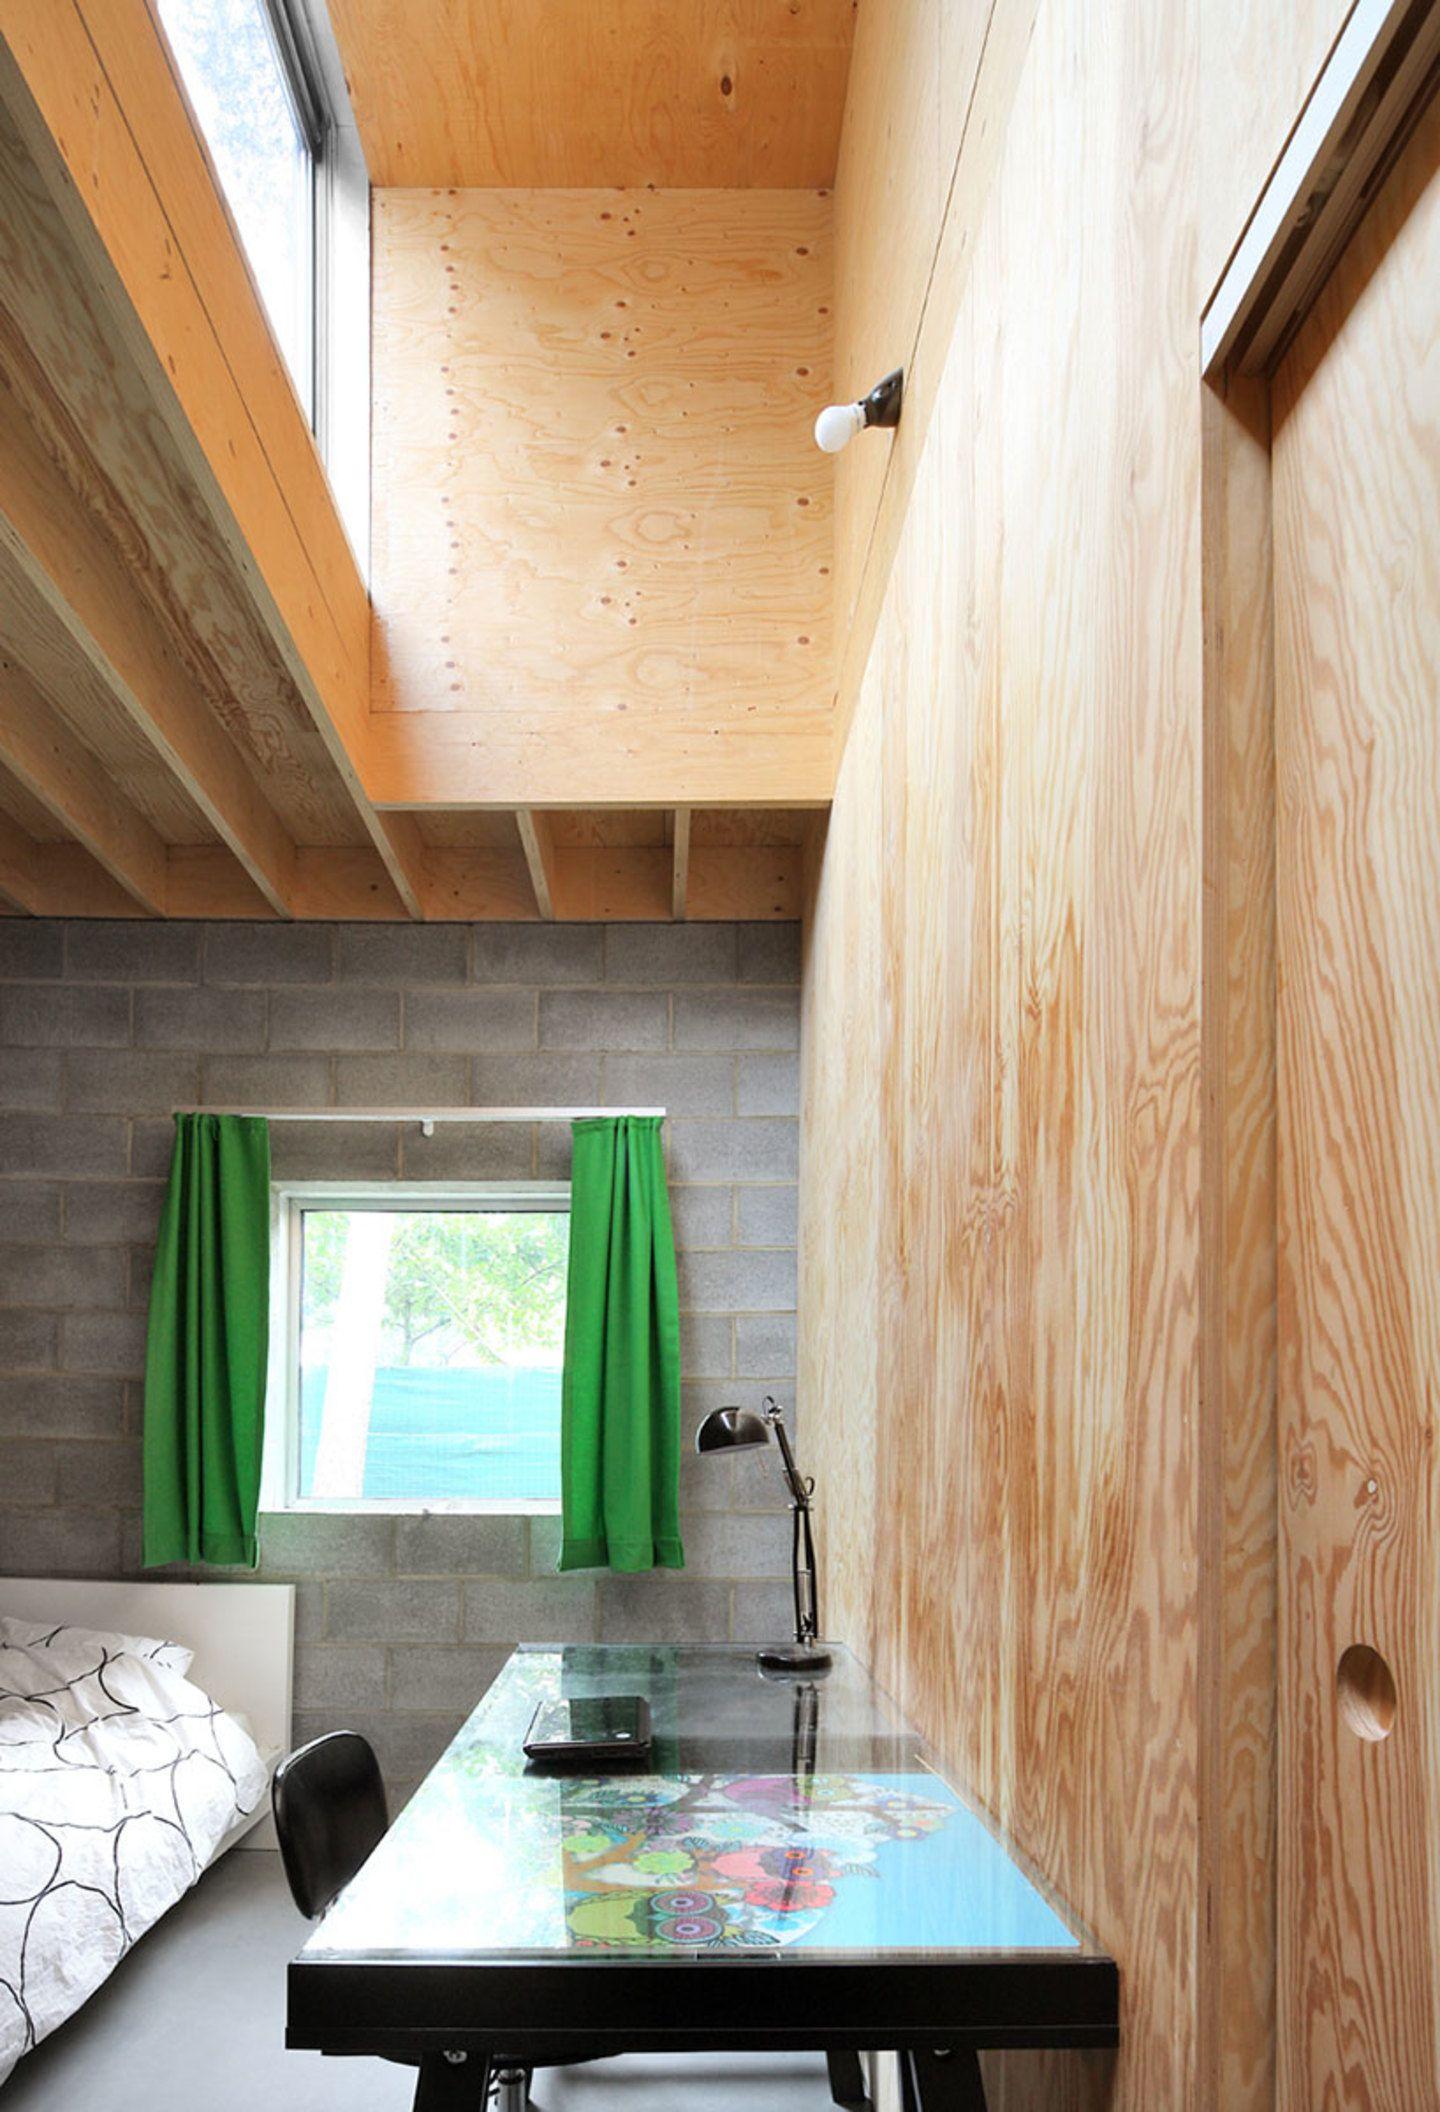 ONO architectuur, Filip Dujardin · Waasmunster House · Divisare ...